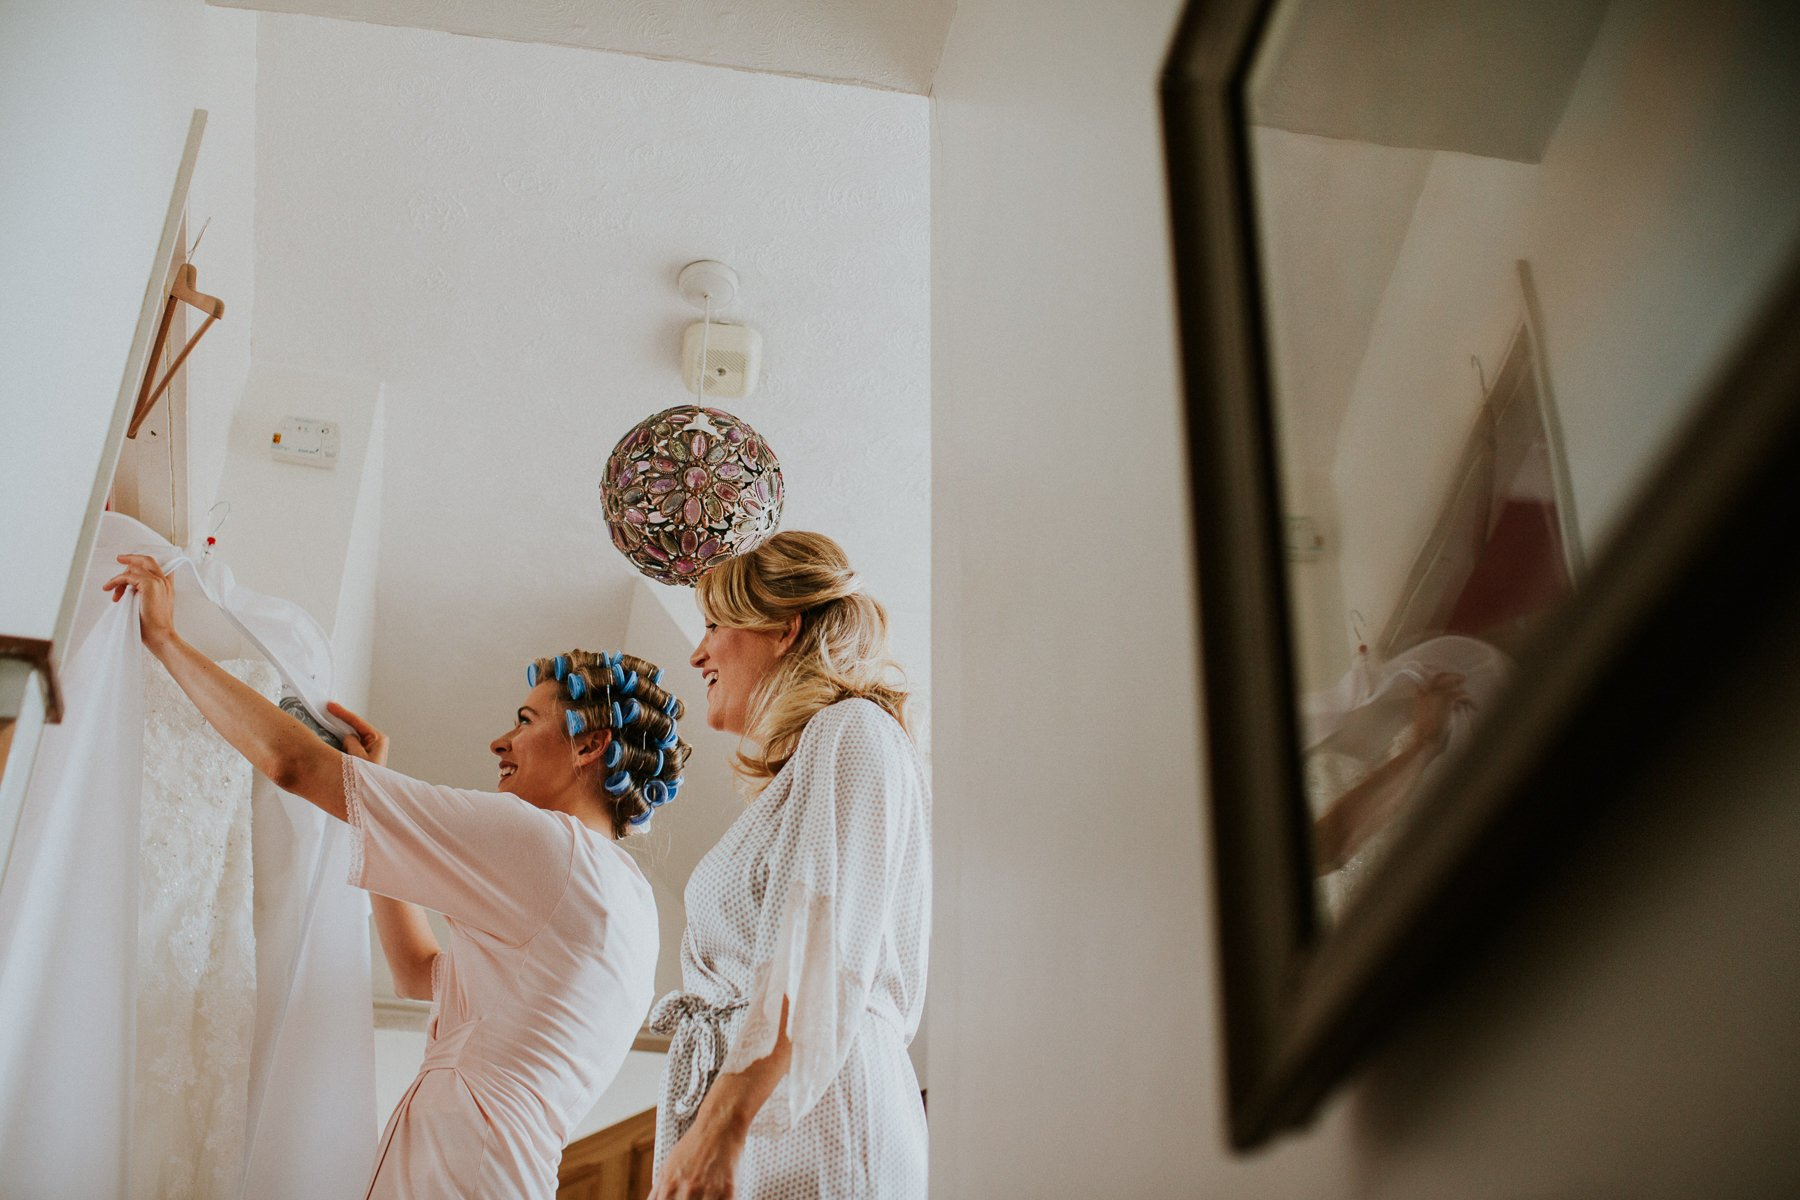 rumbolds-barn-wedding-photography-fazackarley-jess-chris-007